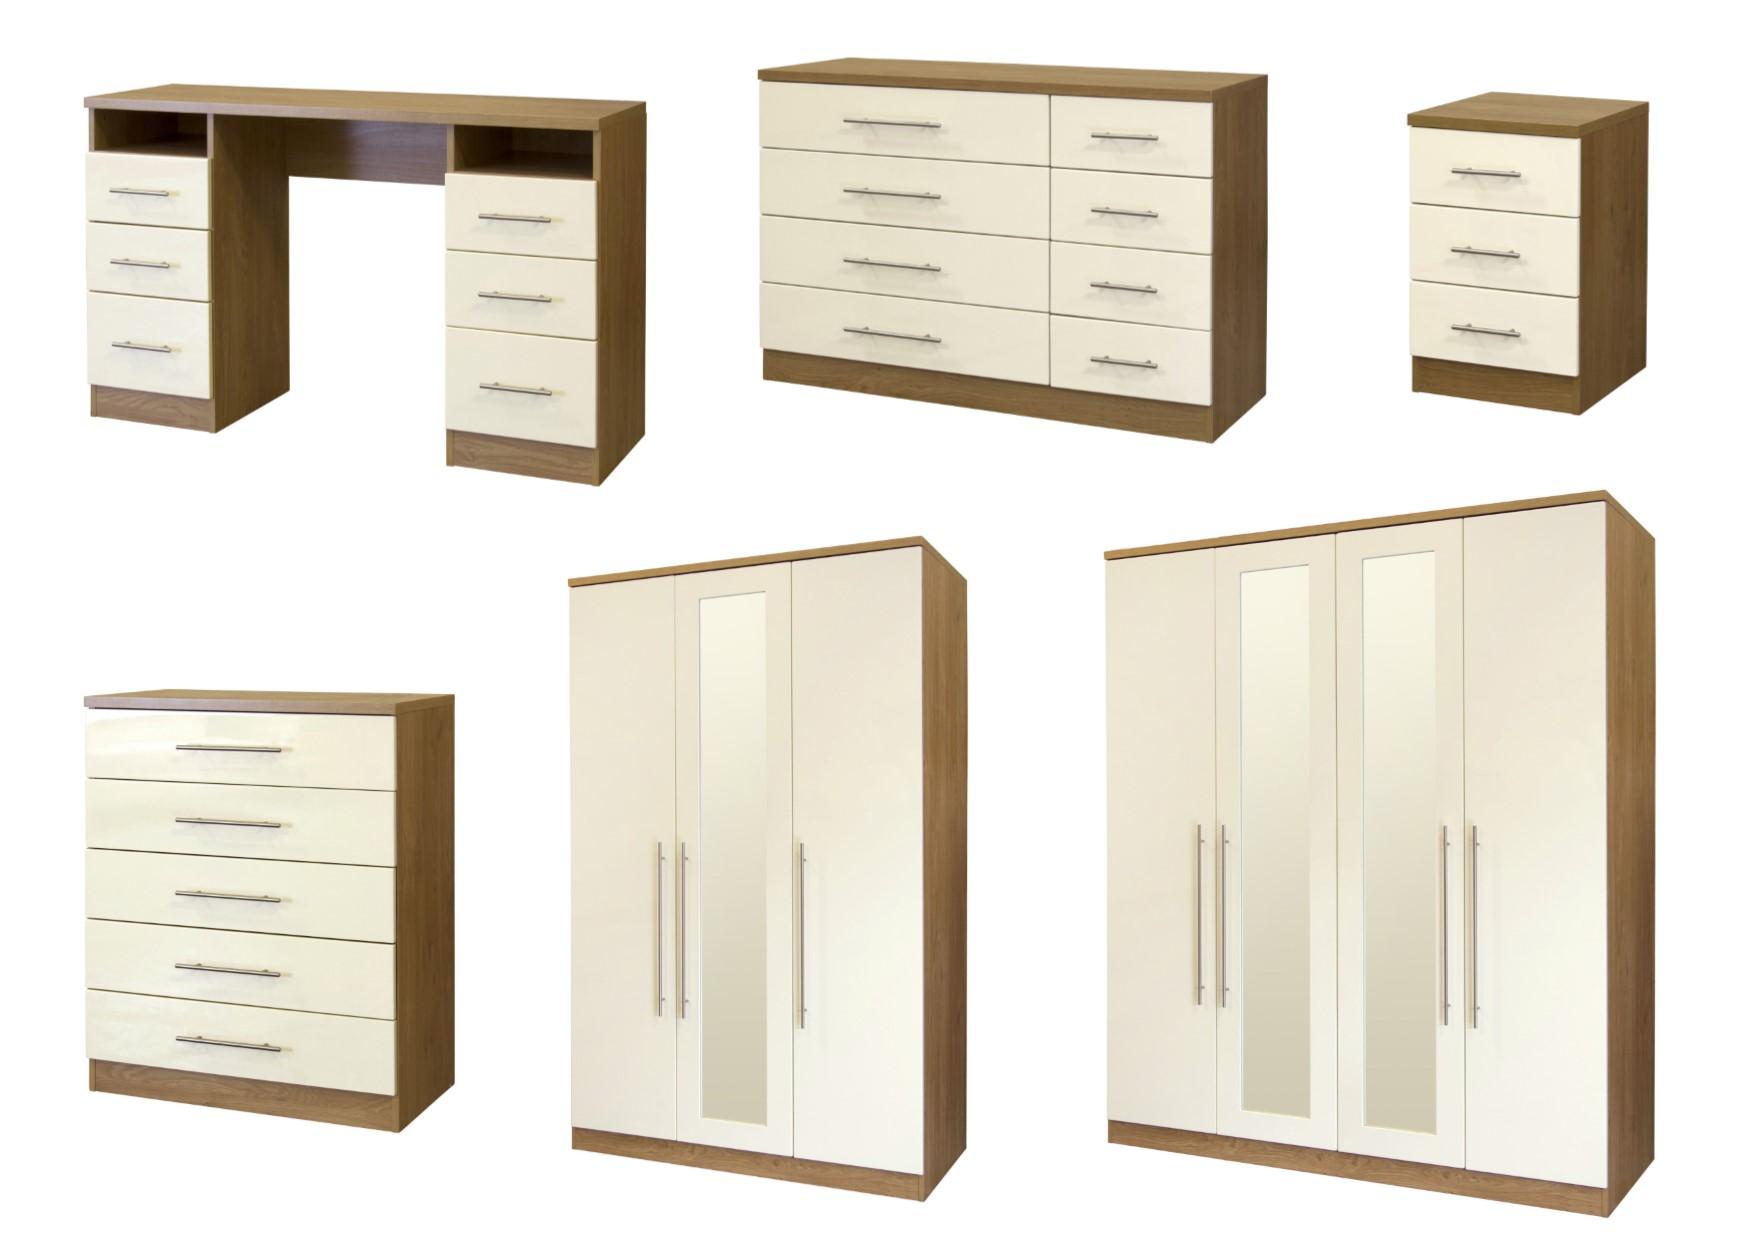 Keswick High Gloss Cream Oak Bedroom Furniture Wardrobe Drawers Bedside